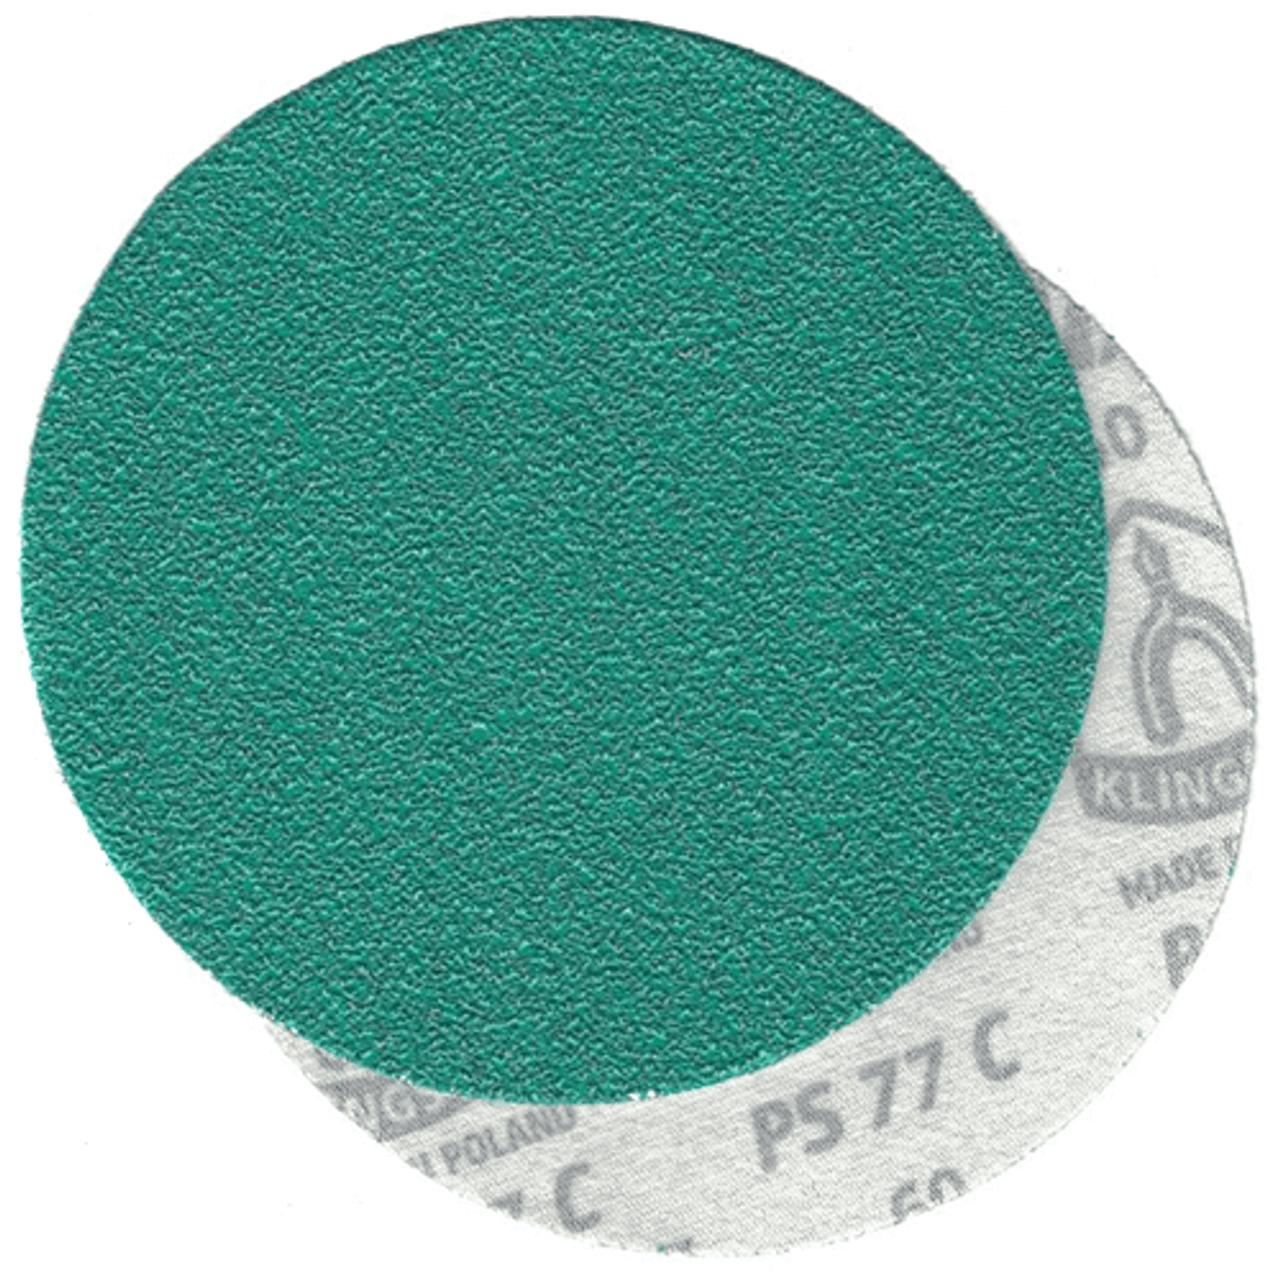 Klingspor Abrasives GreenTec 11 Inch H&L 80 Grit Disc 5pk